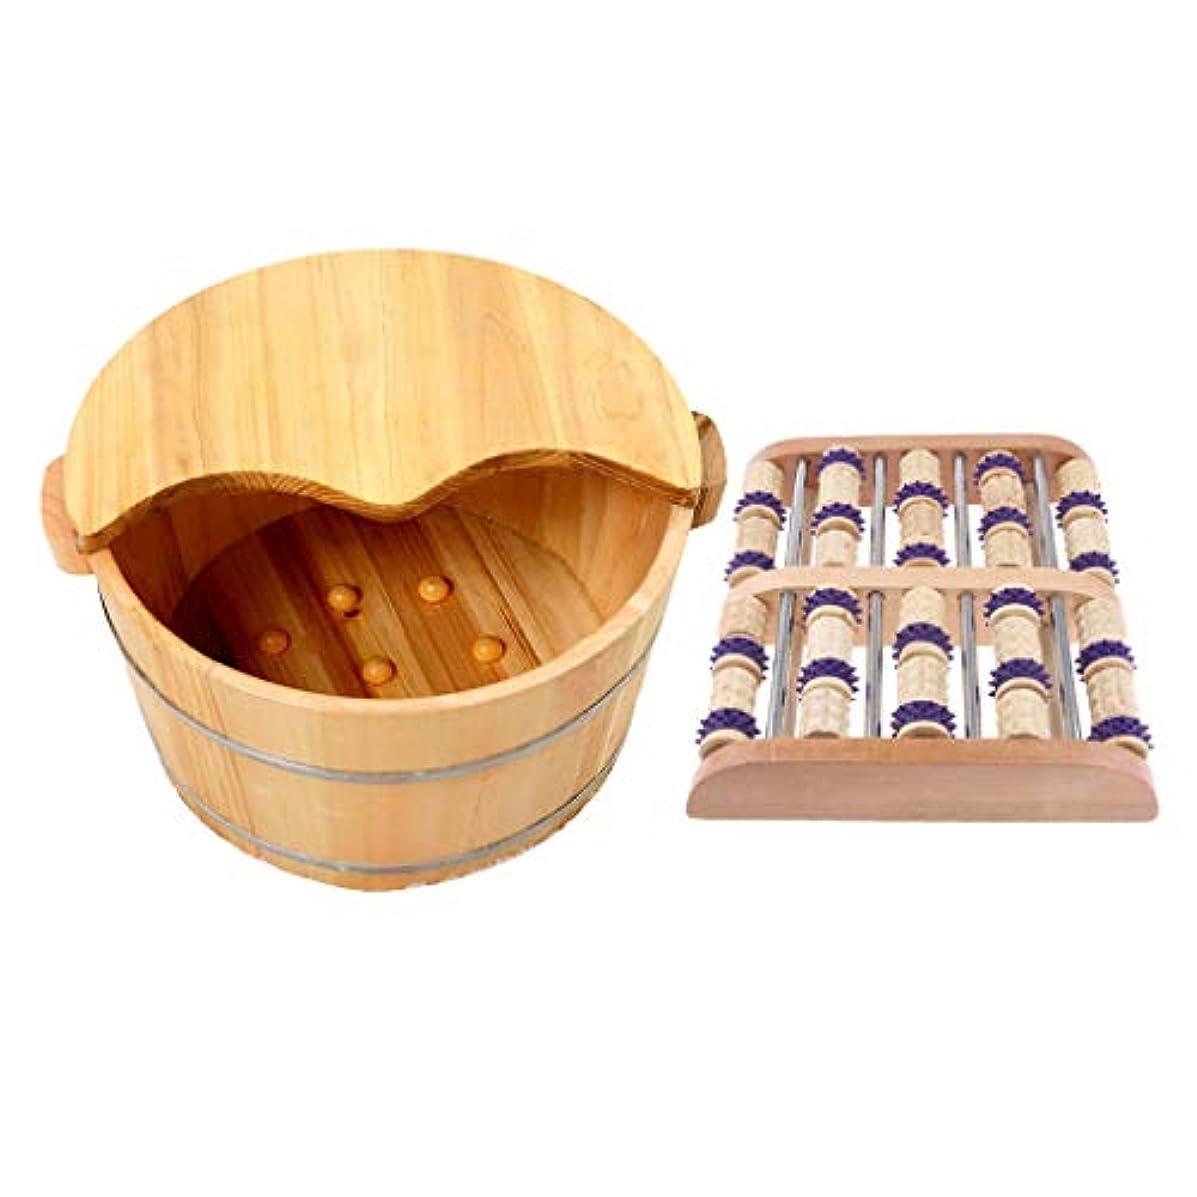 gazechimp 足つぼ マット マッサージフット 手作りウッド タイトステッチ 足裏 ツボ押健康木製の足の洗面台付き